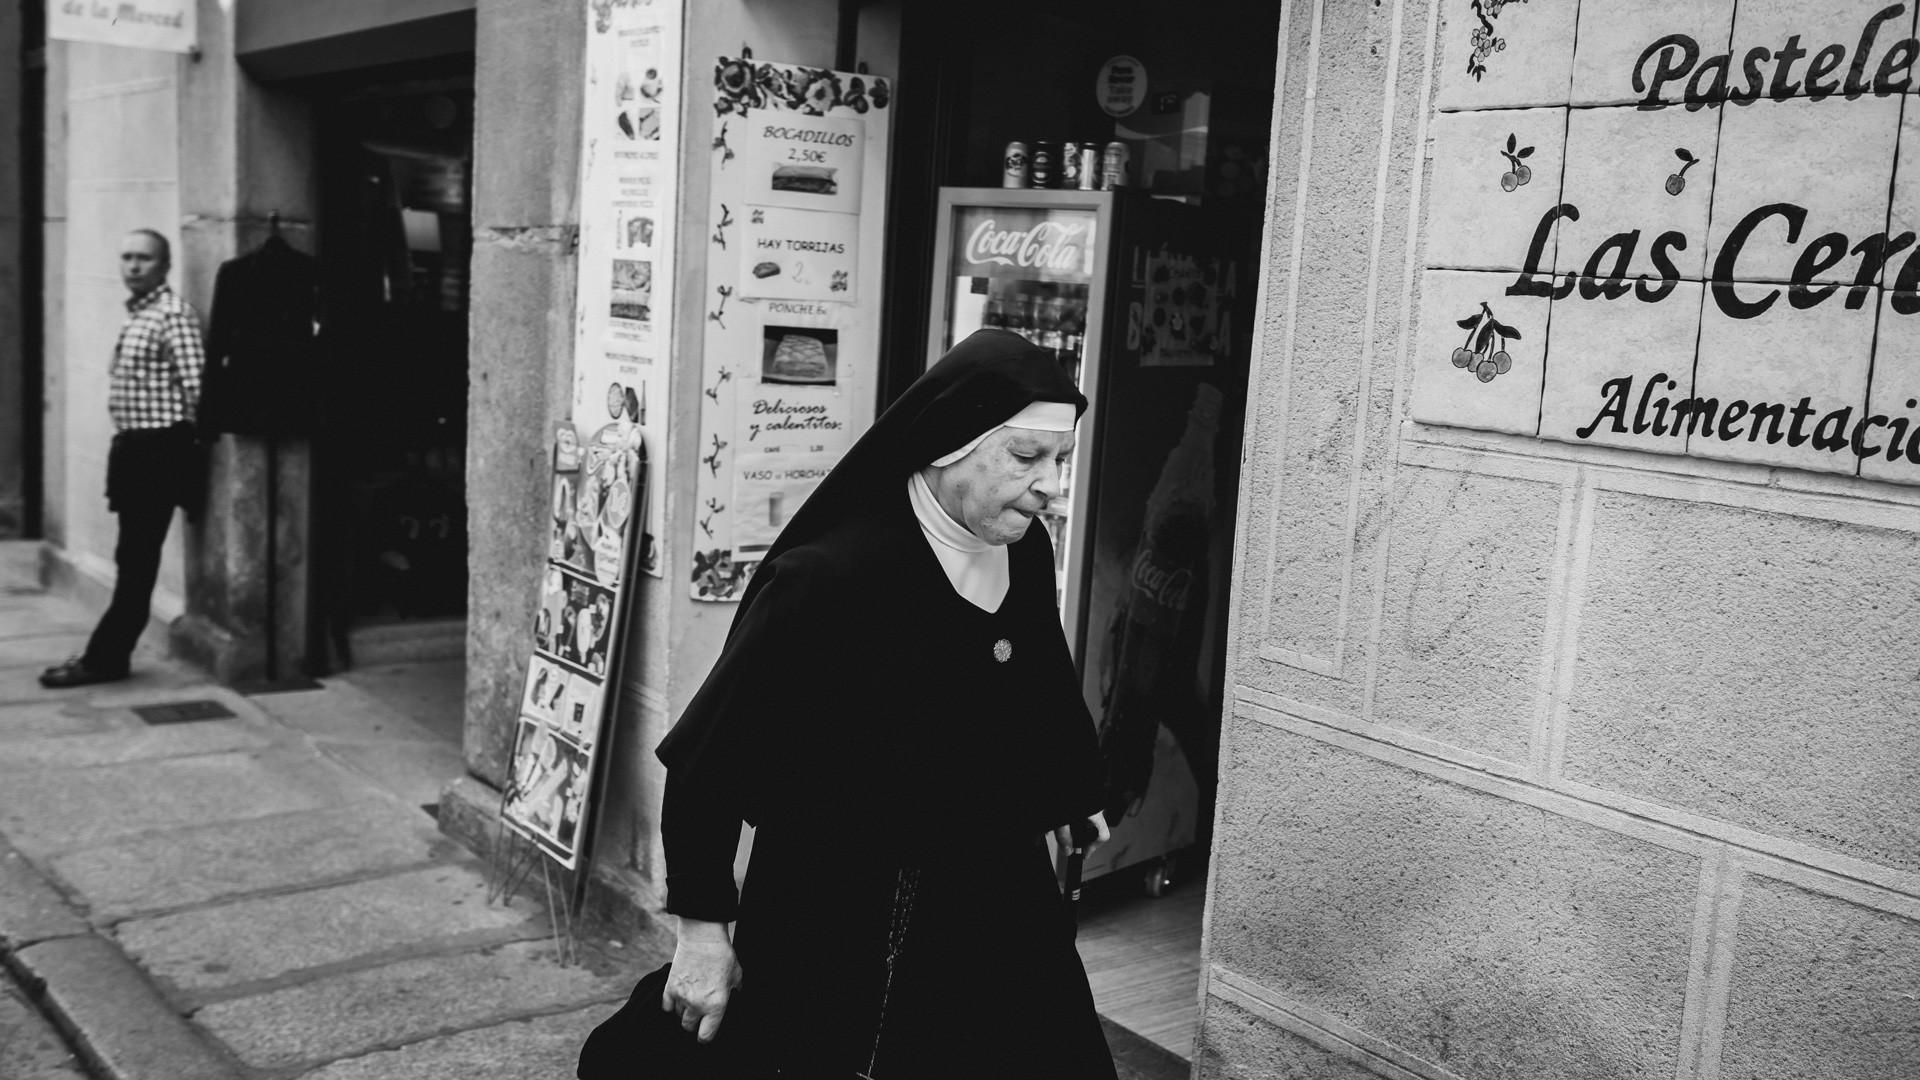 Damien-Dohmen-Photographe-Madrid-20